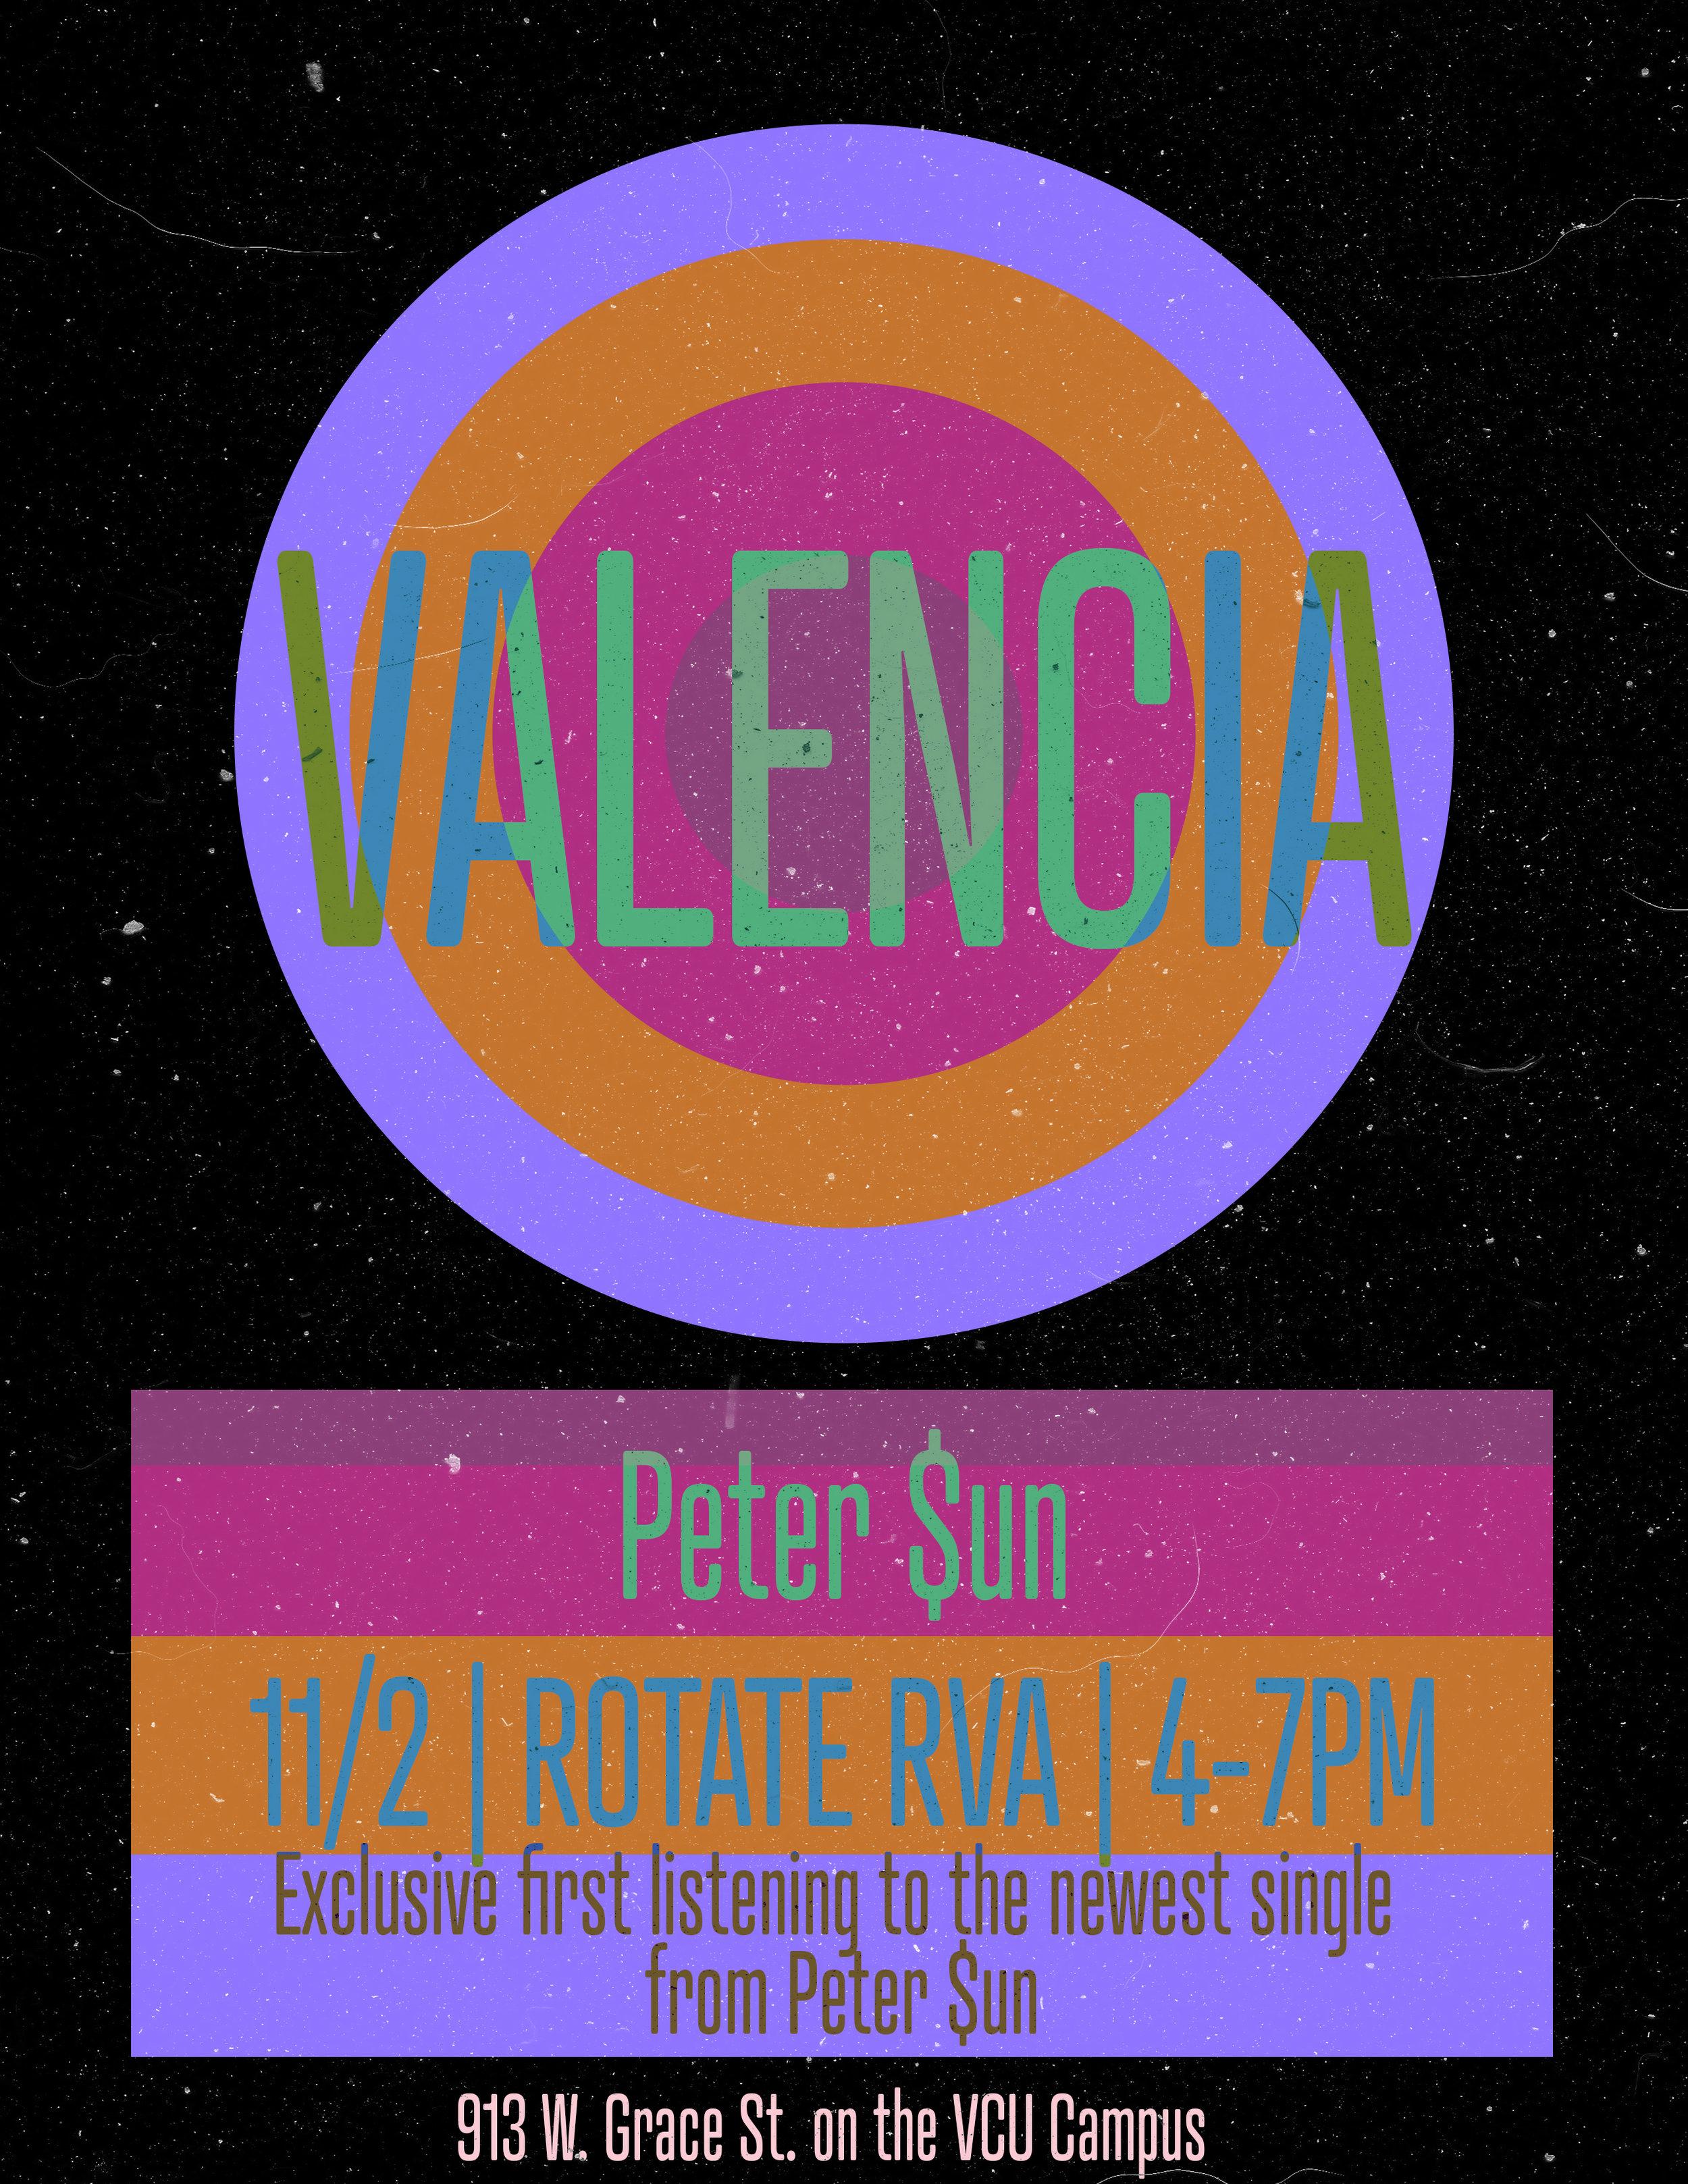 Peter $un Poster Design